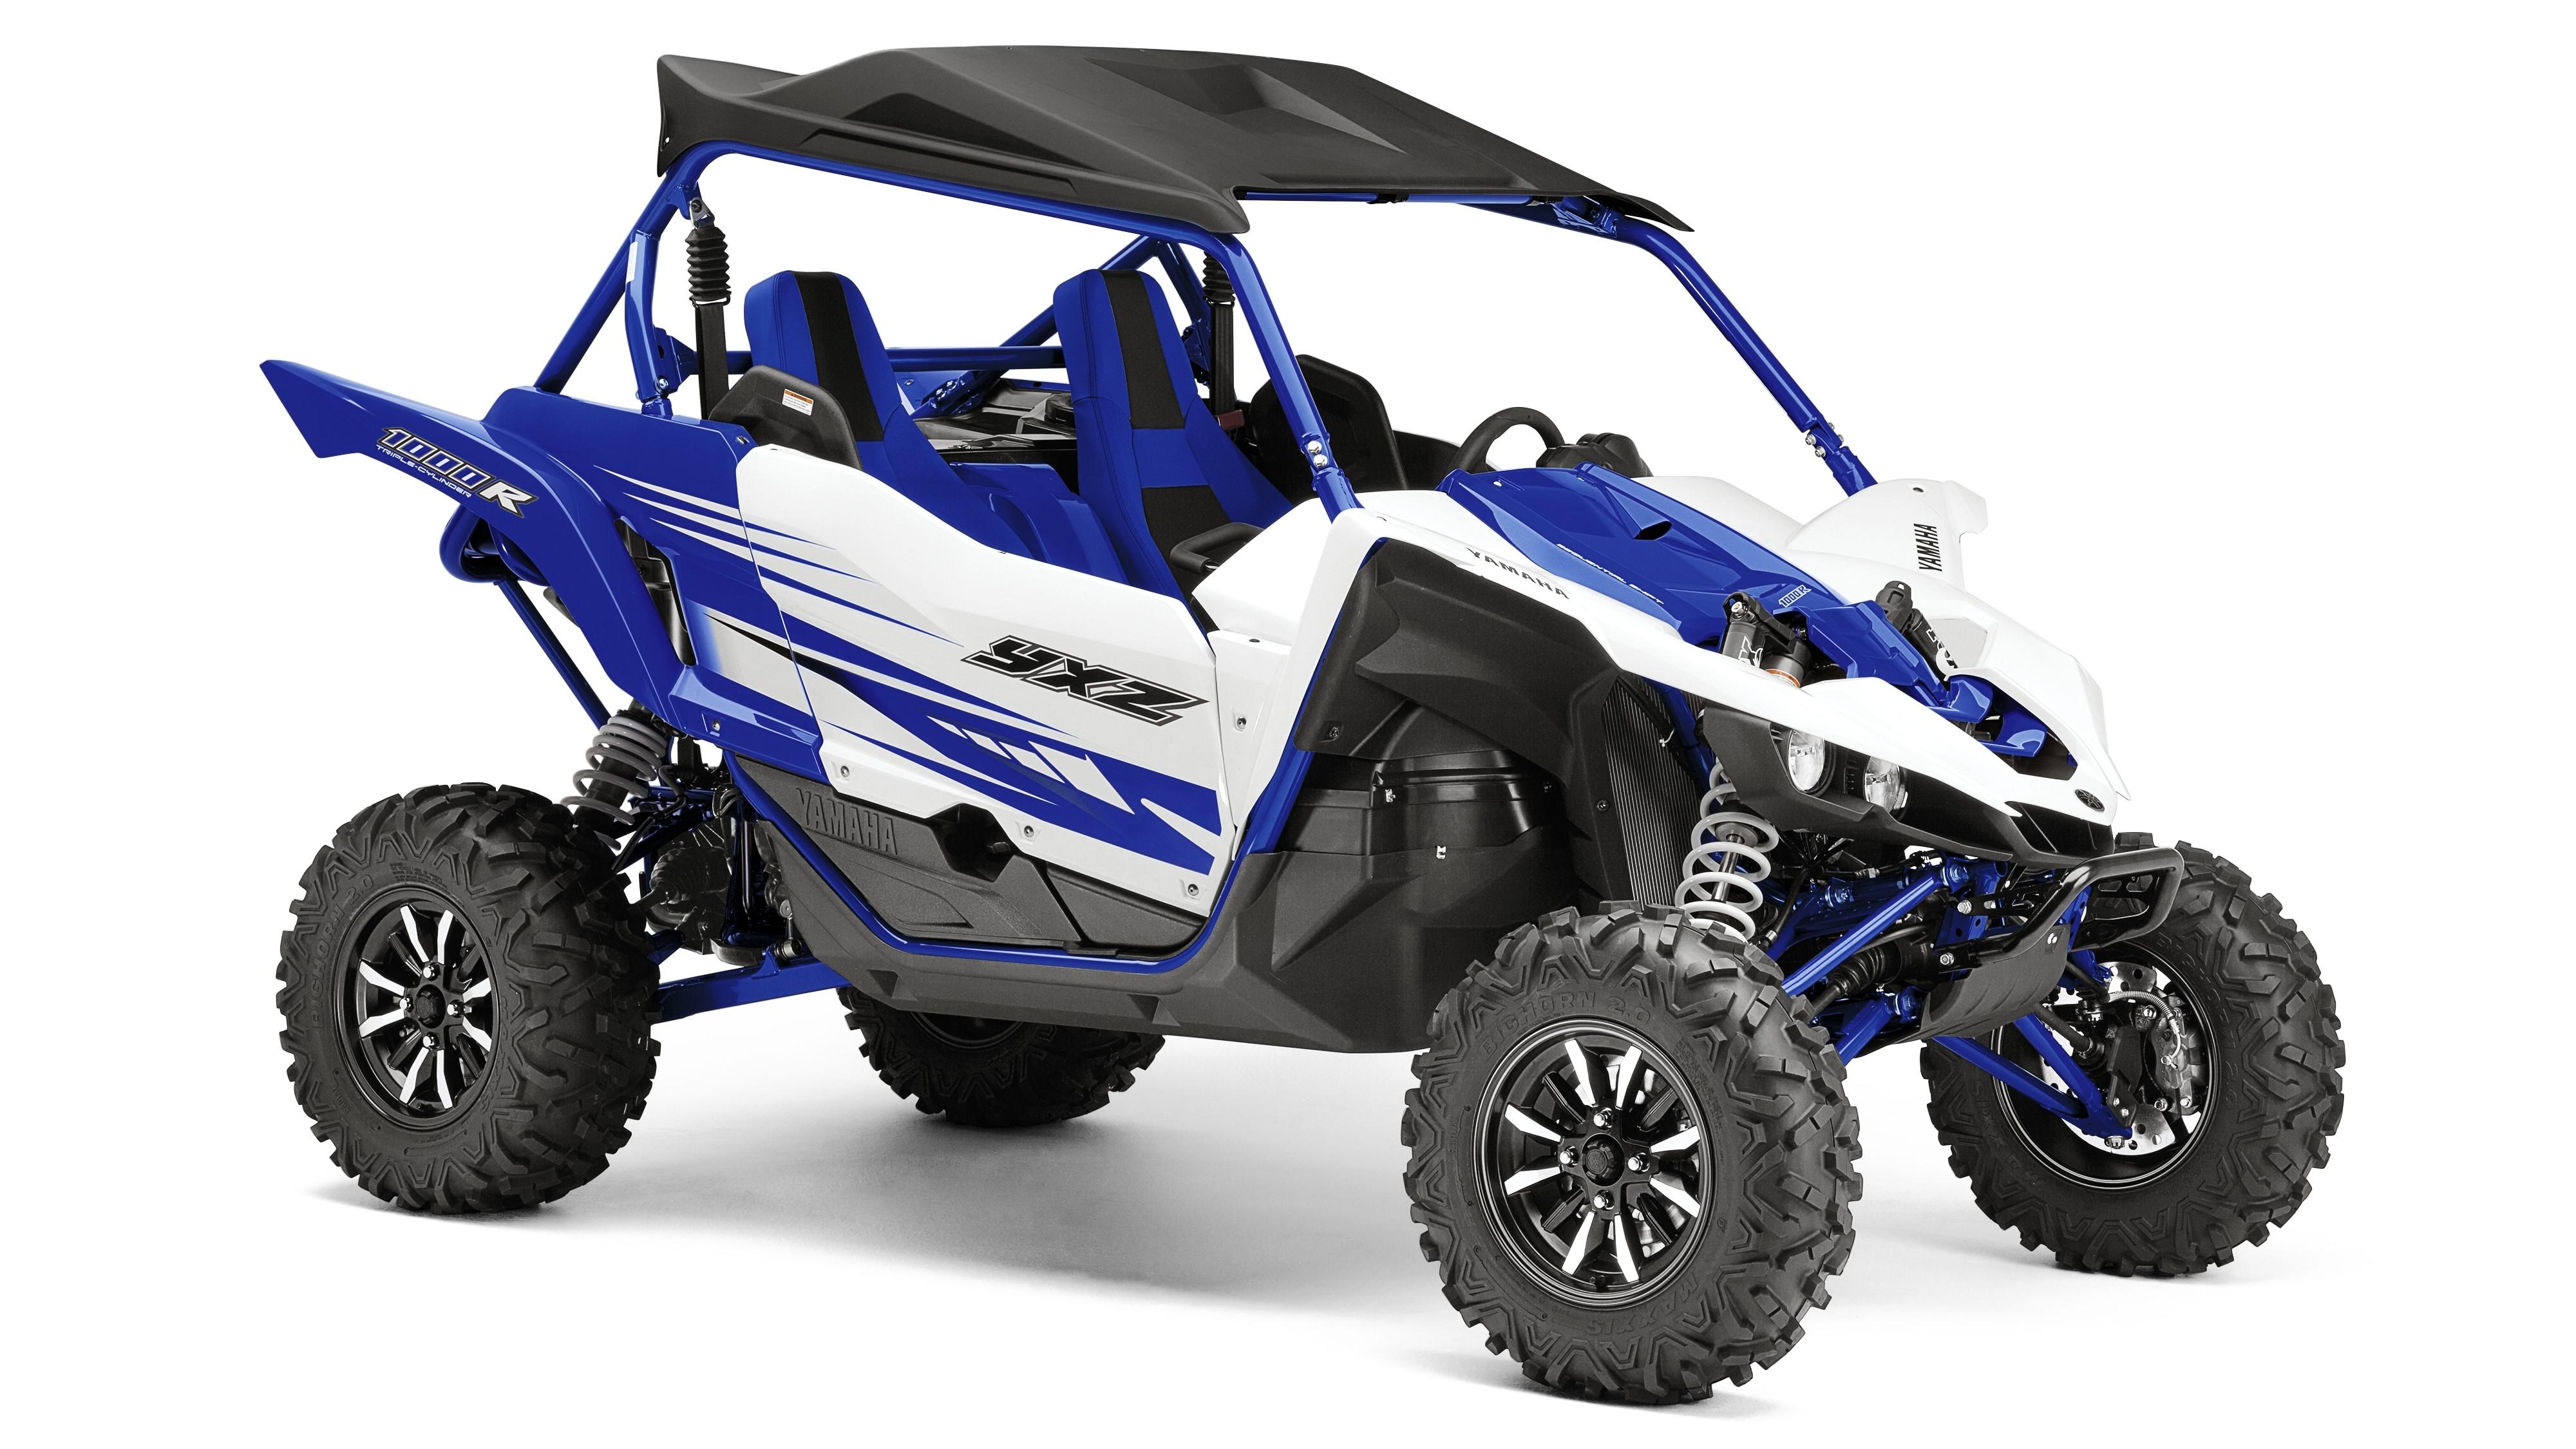 Side By Side Utv >> 2016 Yamaha YXZ1000R Is a Three-Cylinder Supersport SxS - autoevolution